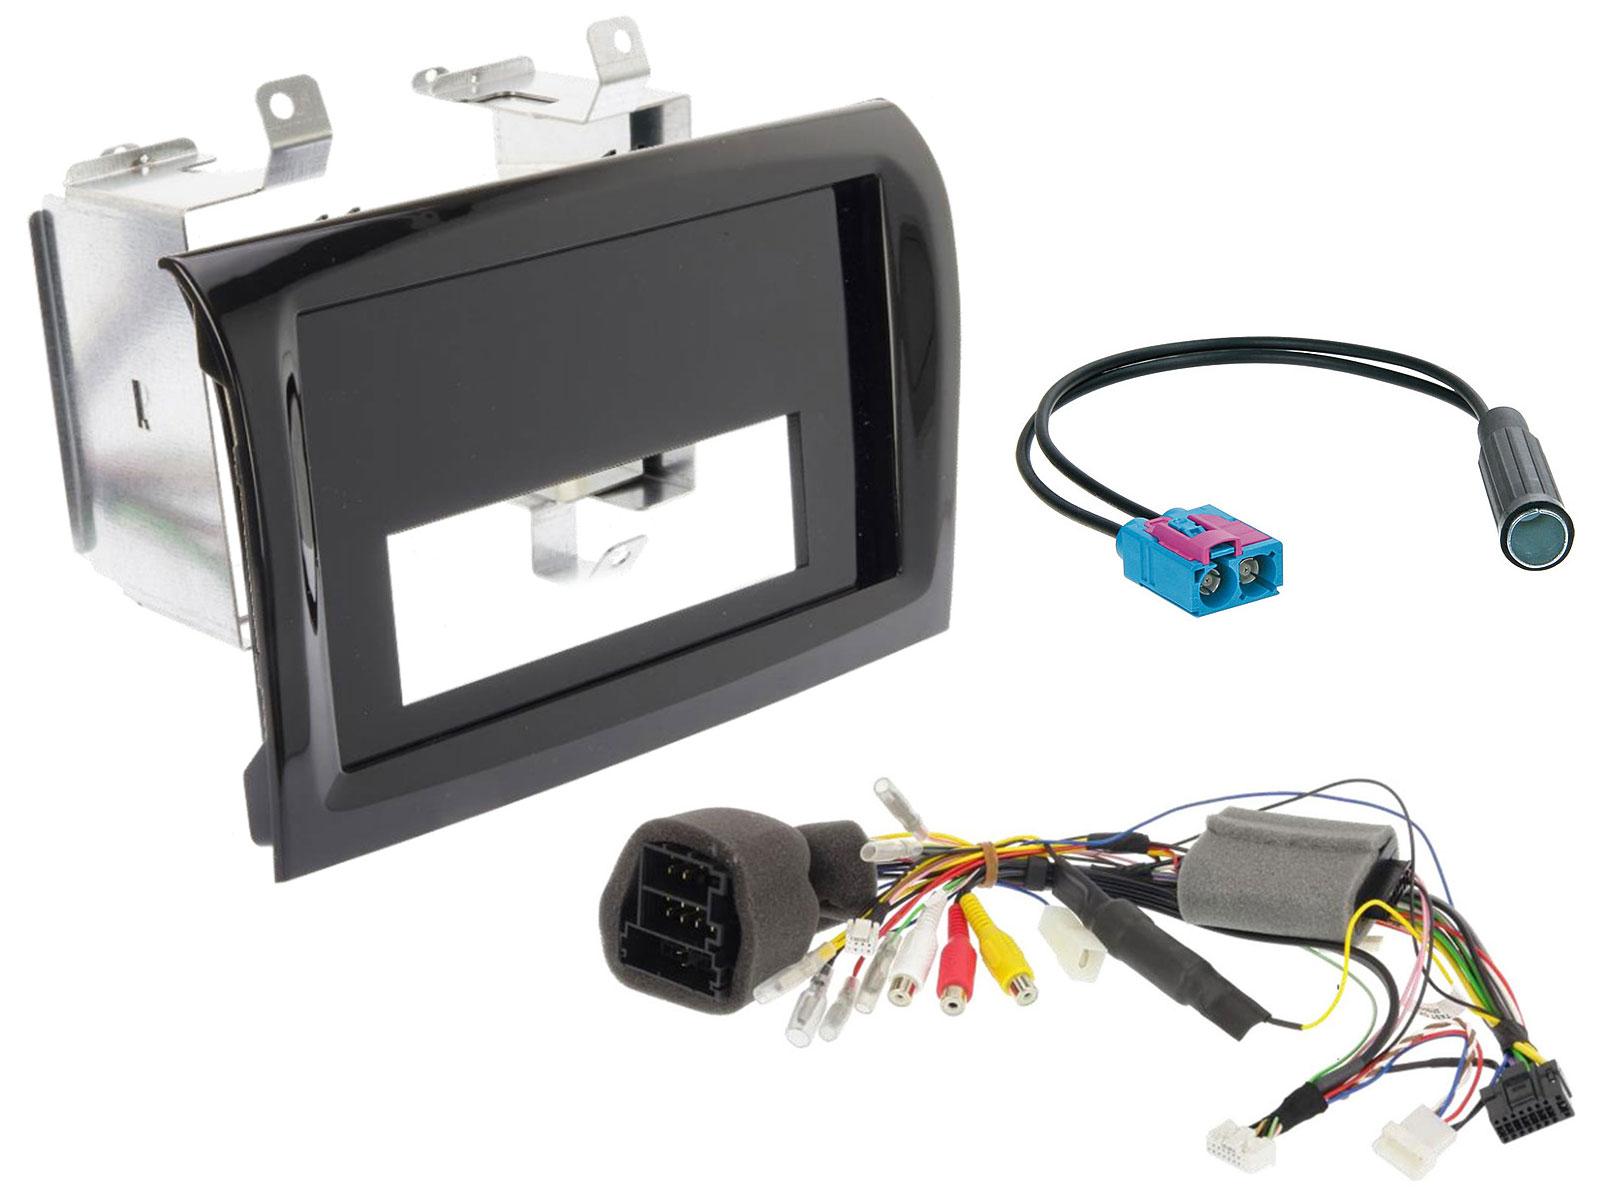 Alpine KIT-H9DUC 2-DIN Installations-Kit für iLX-F903D/INE-F904D/DC im Fiat Ducato, Citroën Jumper, Peugeot Boxer